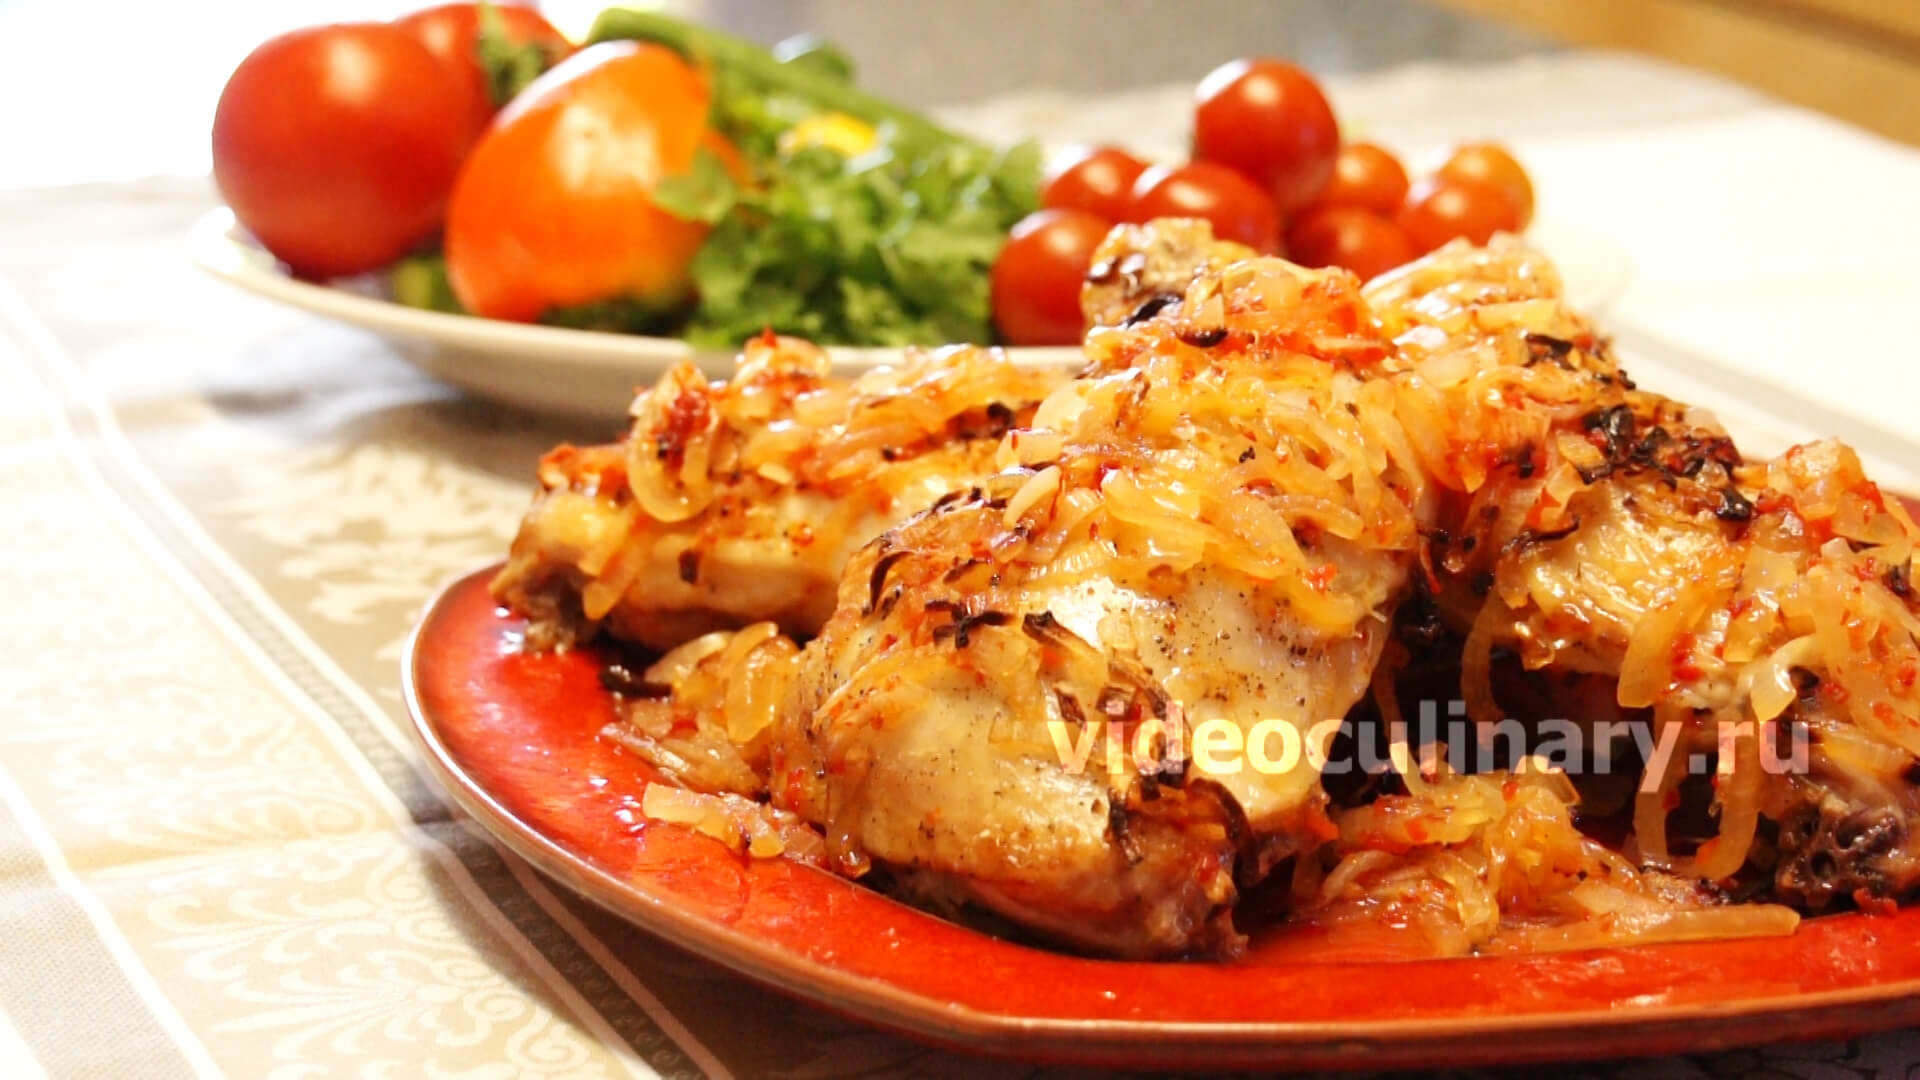 Блюда из окорока рецепты